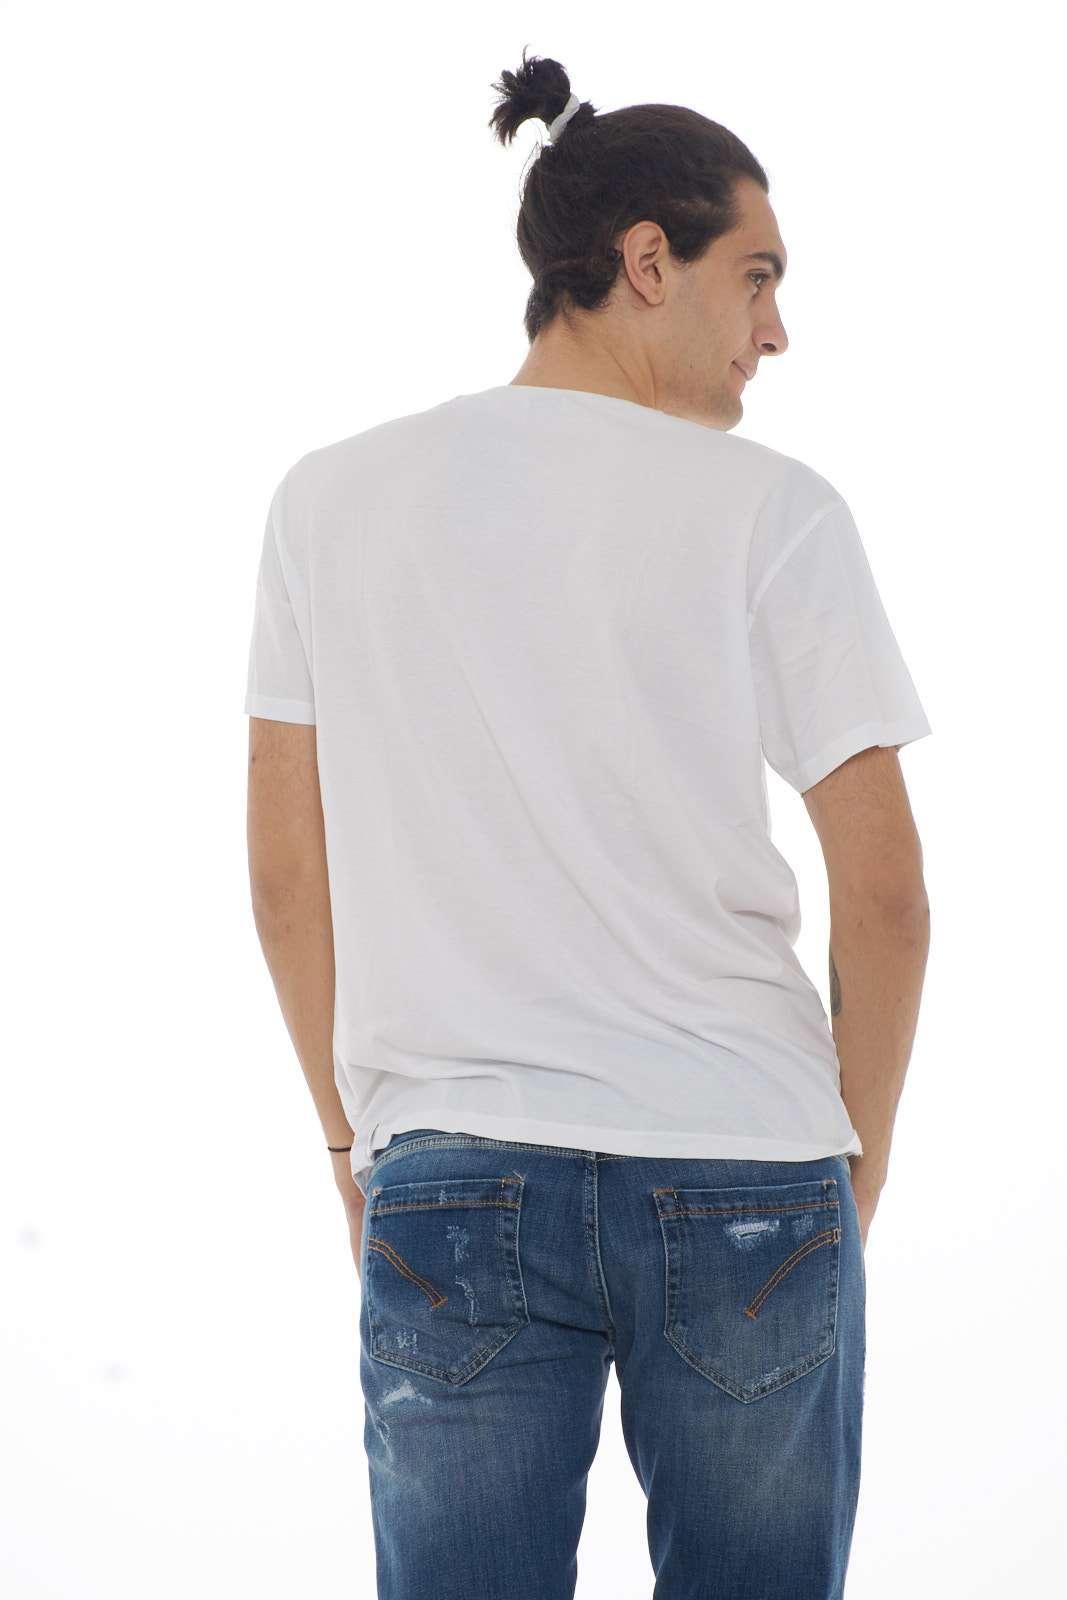 https://www.parmax.com/media/catalog/product/a/i/PE_outlet_parmax-t-shirt-uomo-Bomboogie-TM5602-C.jpg